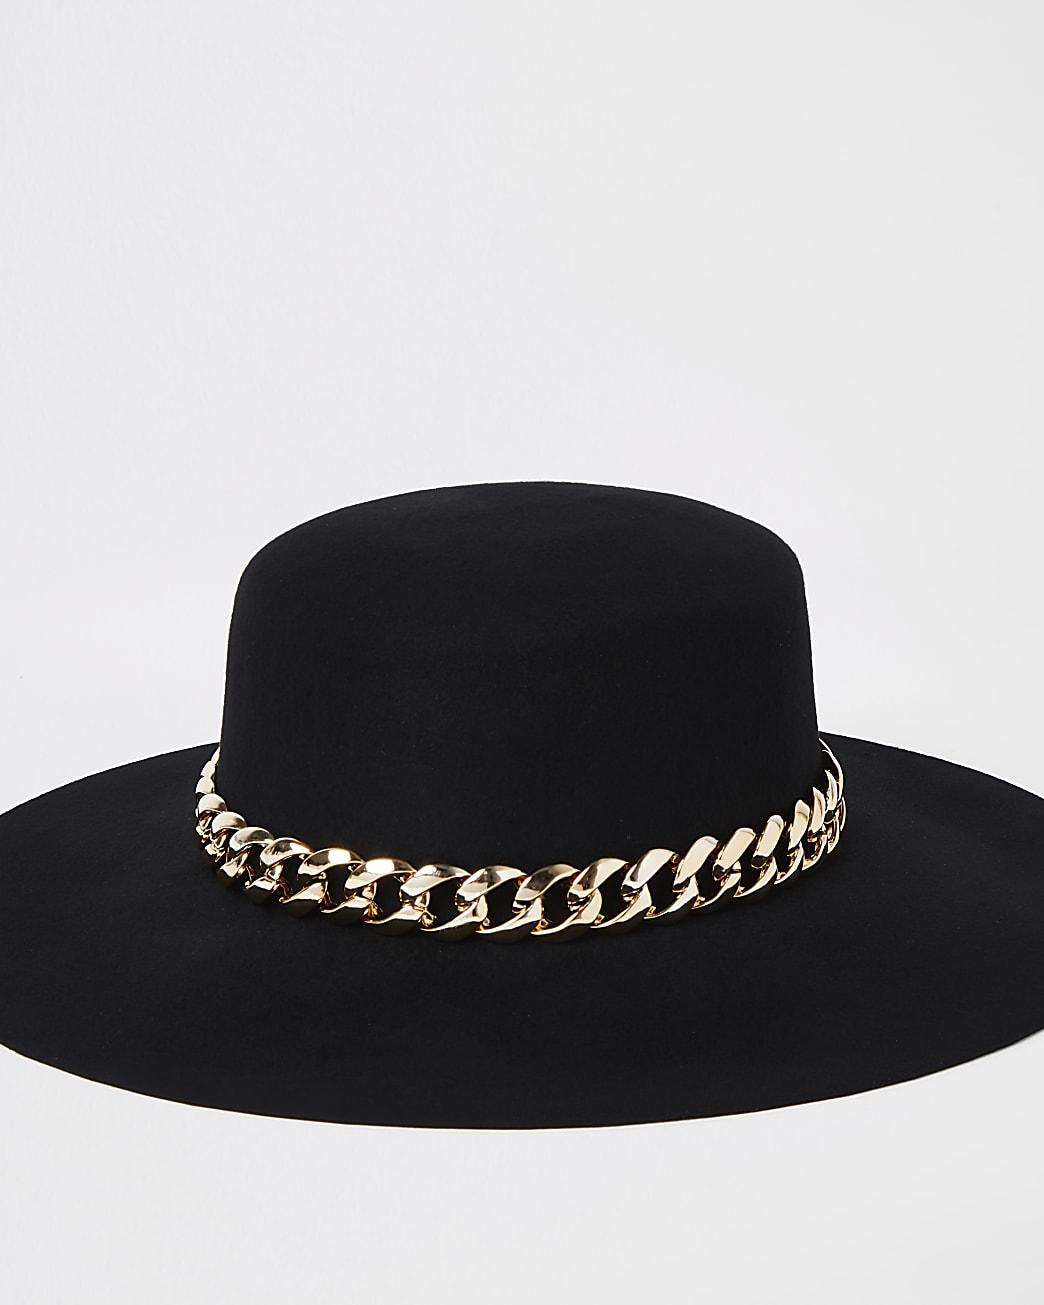 Black gold chain trim fedora hat